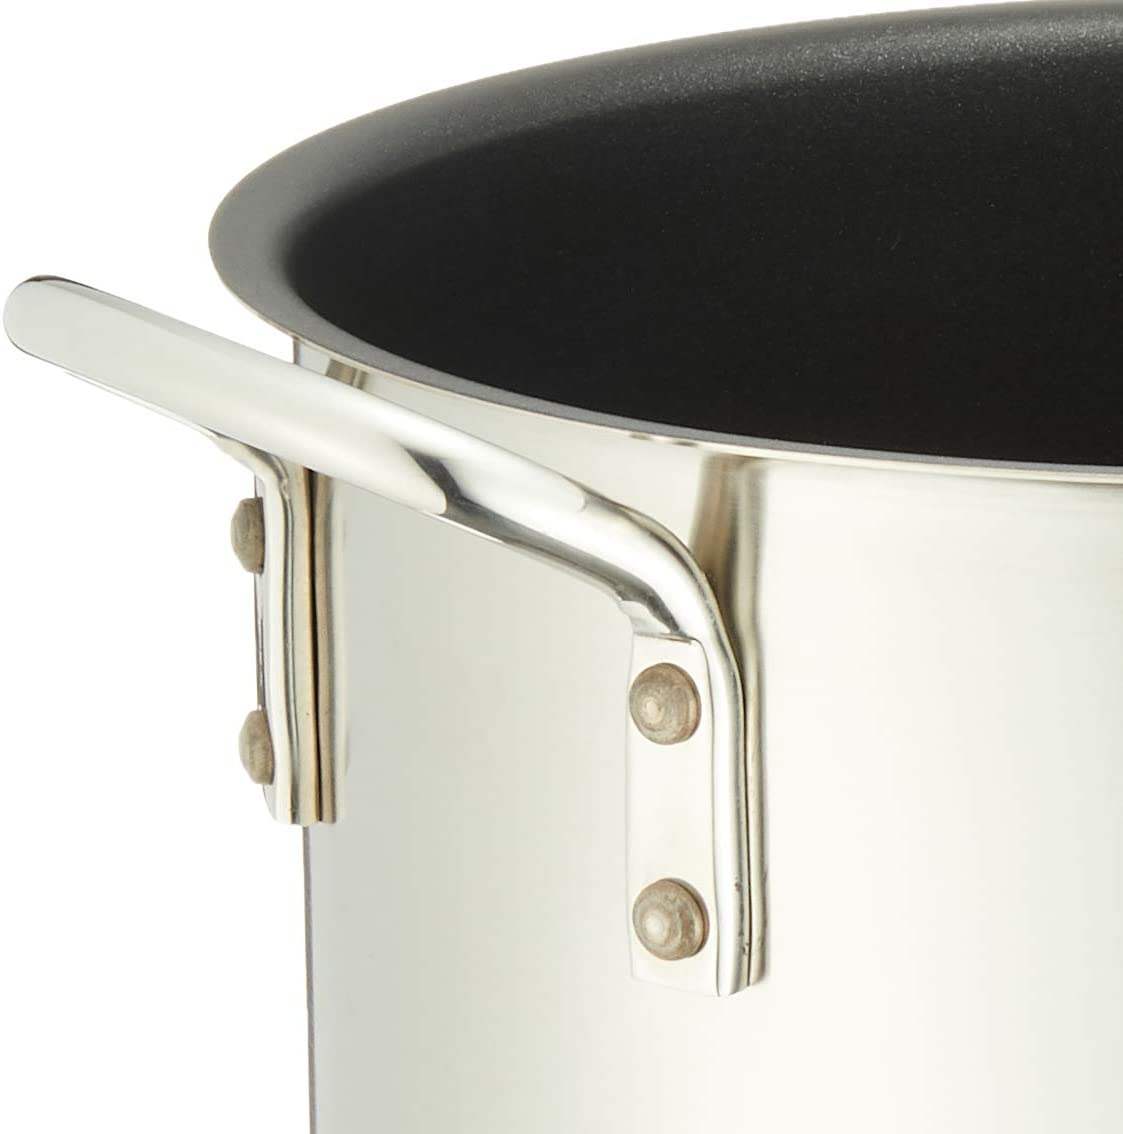 Murano(ムラノ) インダクション  テフロンセレクト 寸胴鍋 (蓋無)24cm 18-8 AZV-78の商品画像5